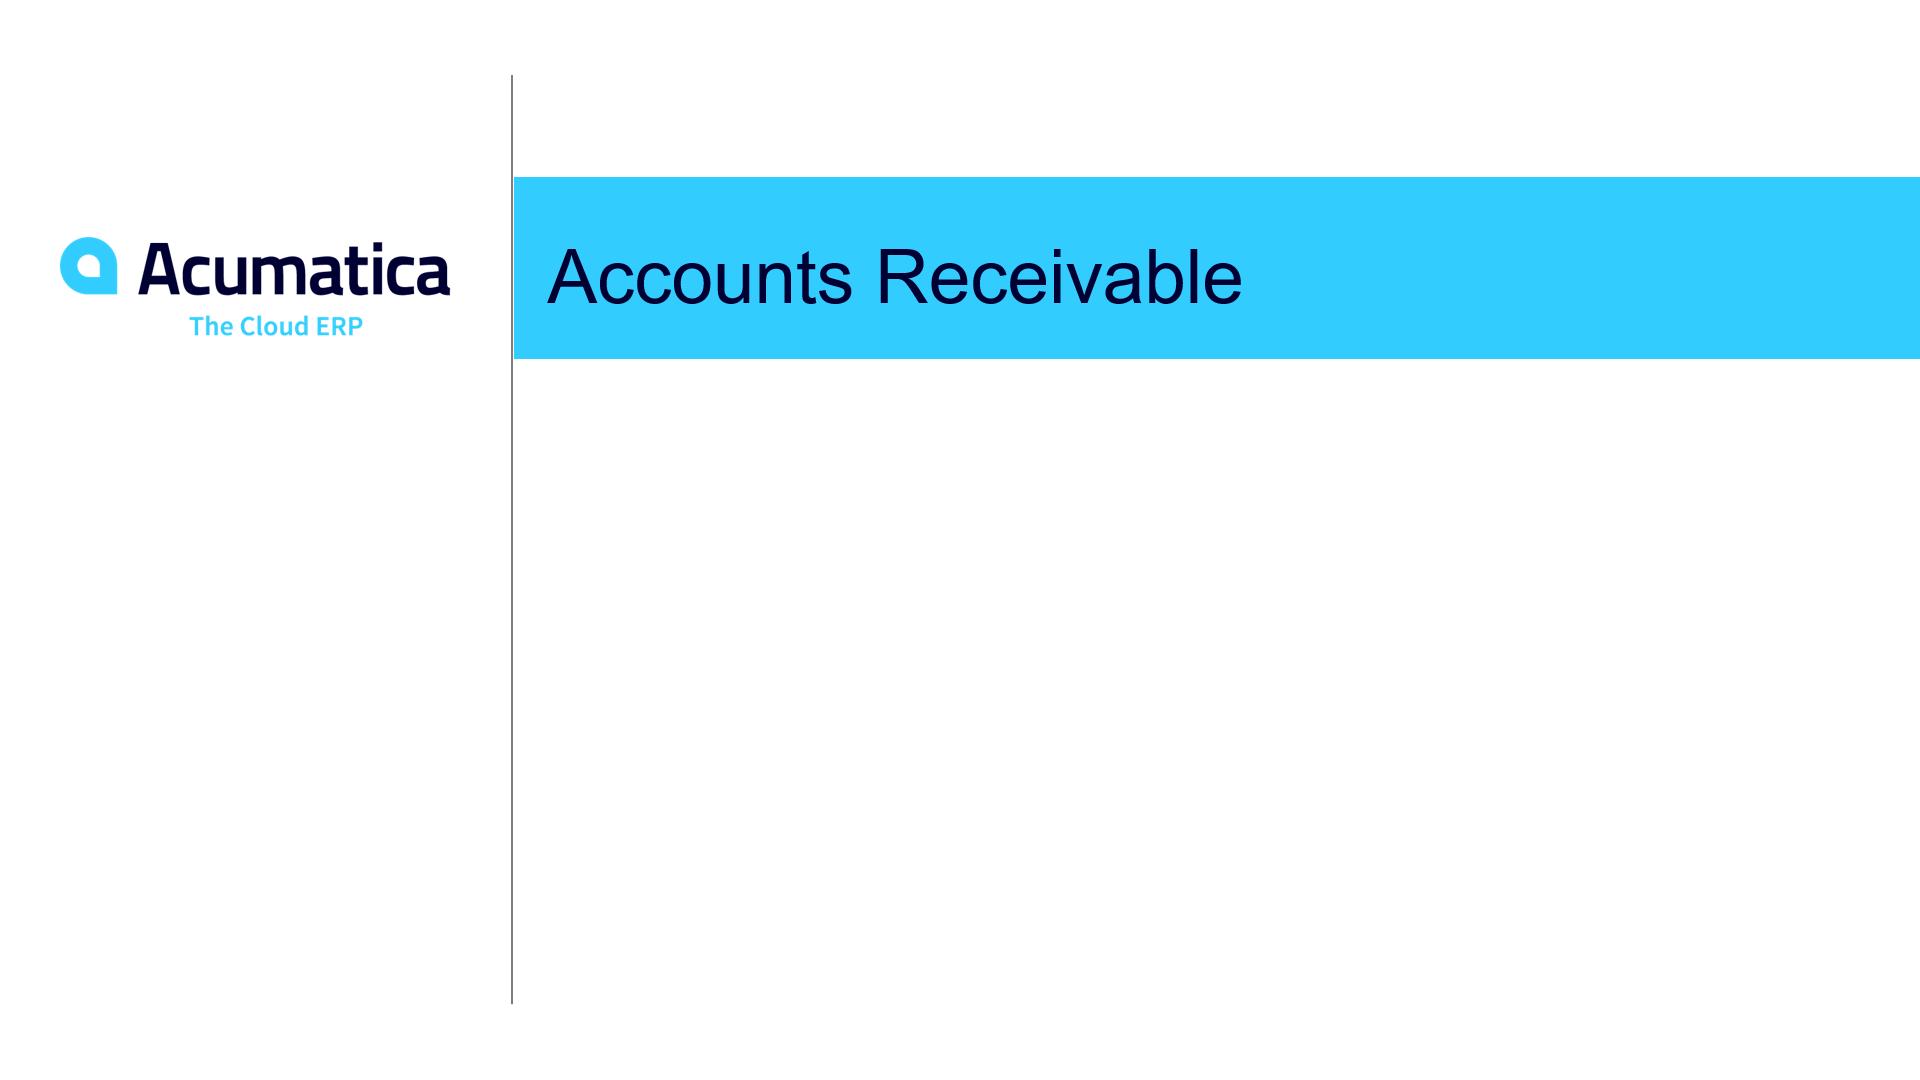 Accounts Receivable Overview